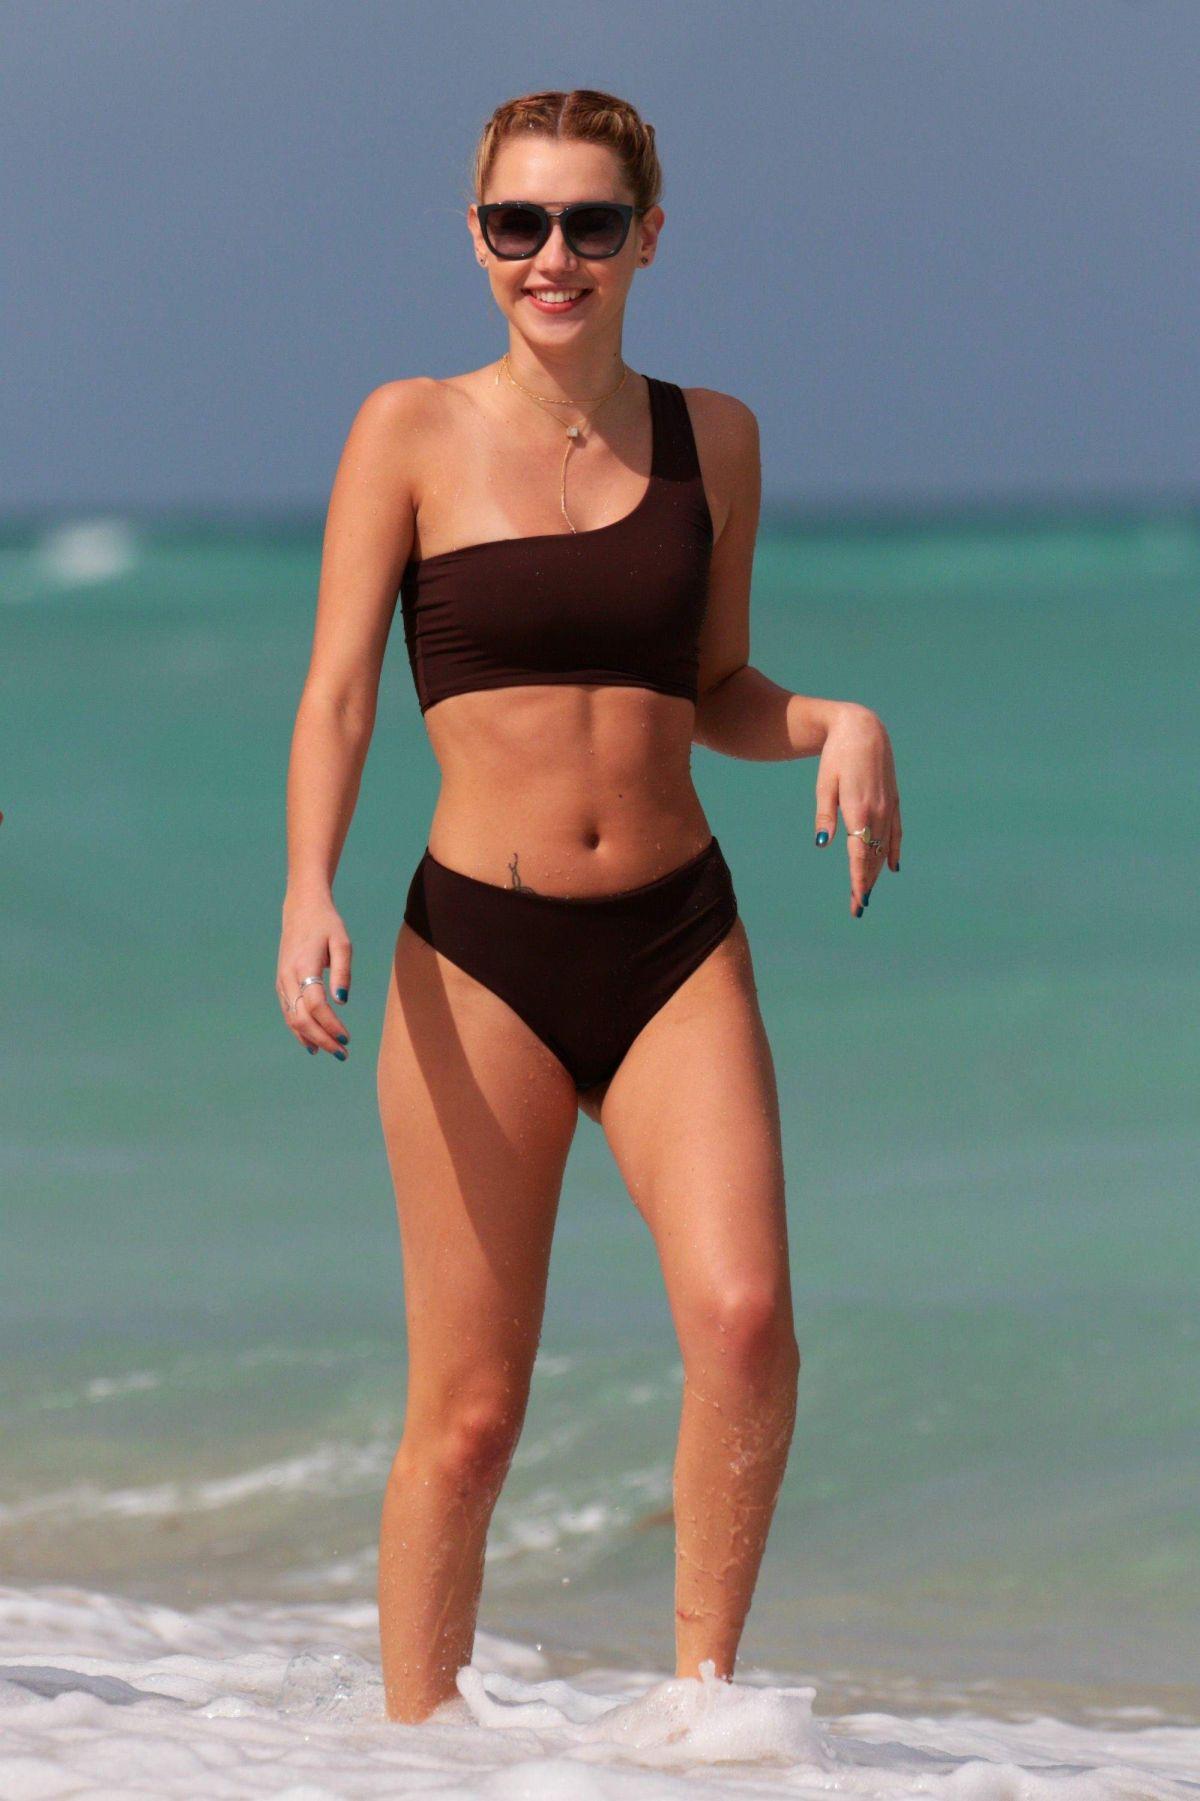 Bikini Sarah Snyder nudes (76 photos), Ass, Leaked, Instagram, in bikini 2006